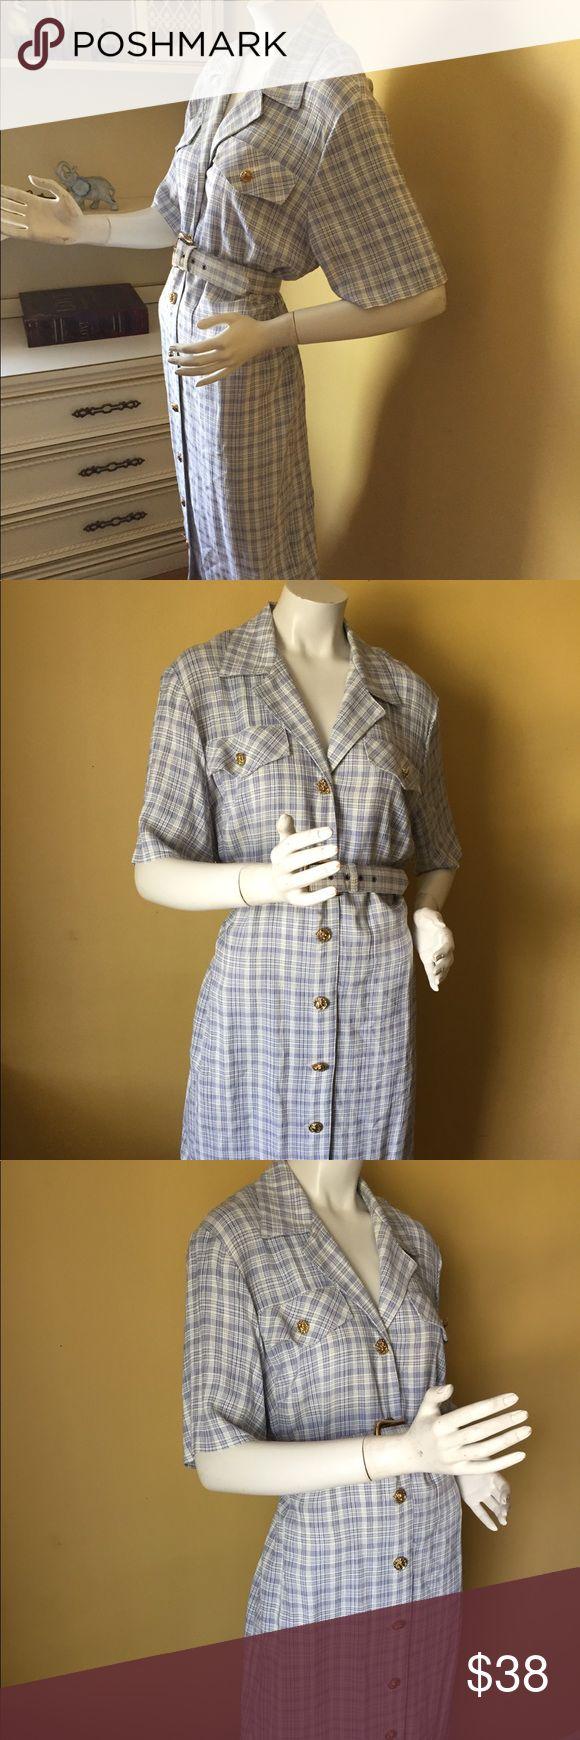 "Vintage Tracy Edwards petite dress Vintage Tracy Edwards petite dress. Union label. 55% acetate, 45% rayon. Length 42.5"", waist 40"", bust 47"". Vintage Dresses"